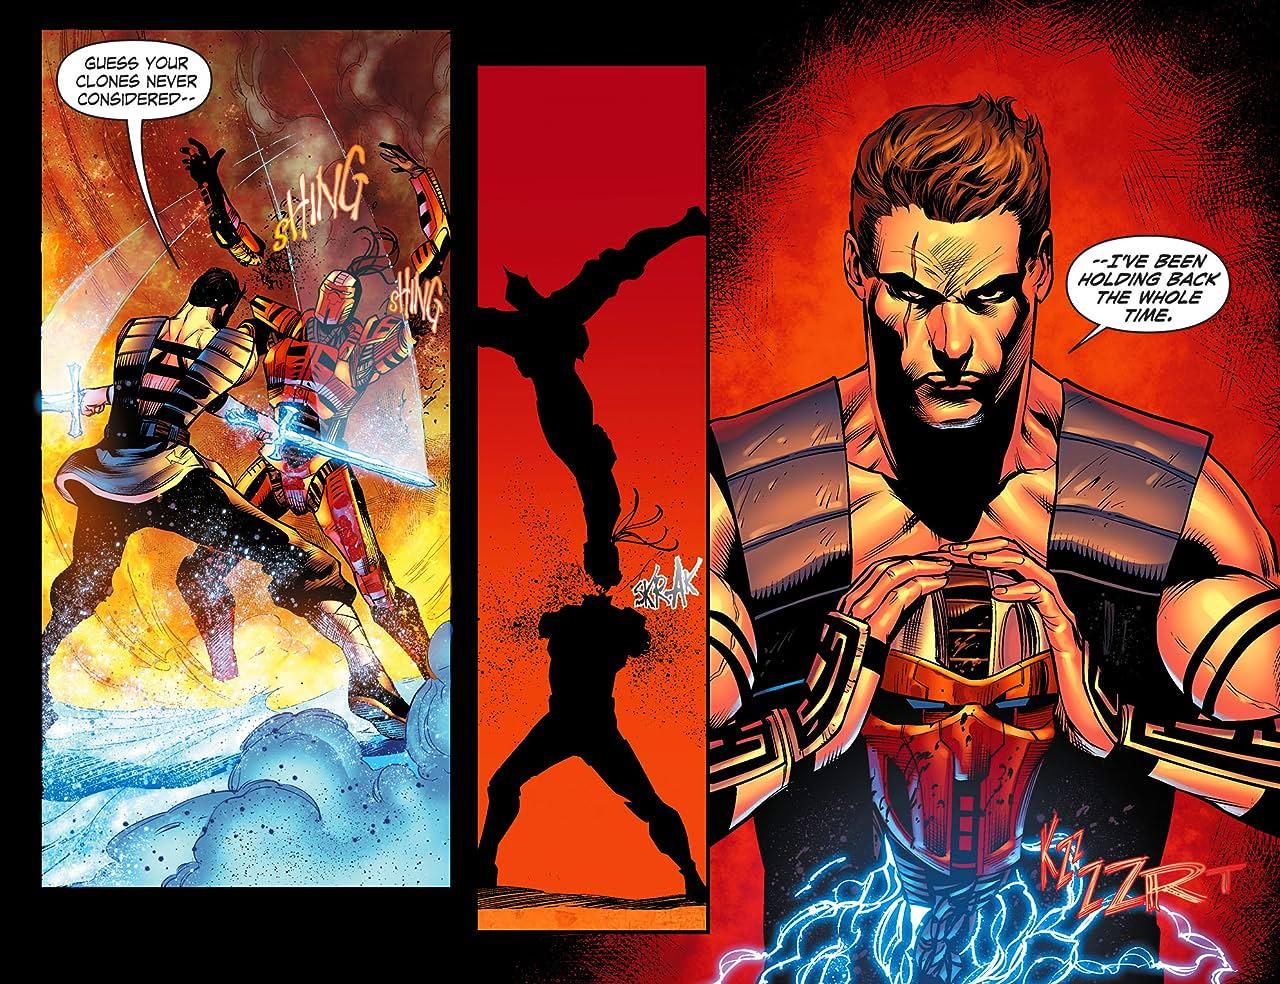 Mortal Kombat X (2015) #36